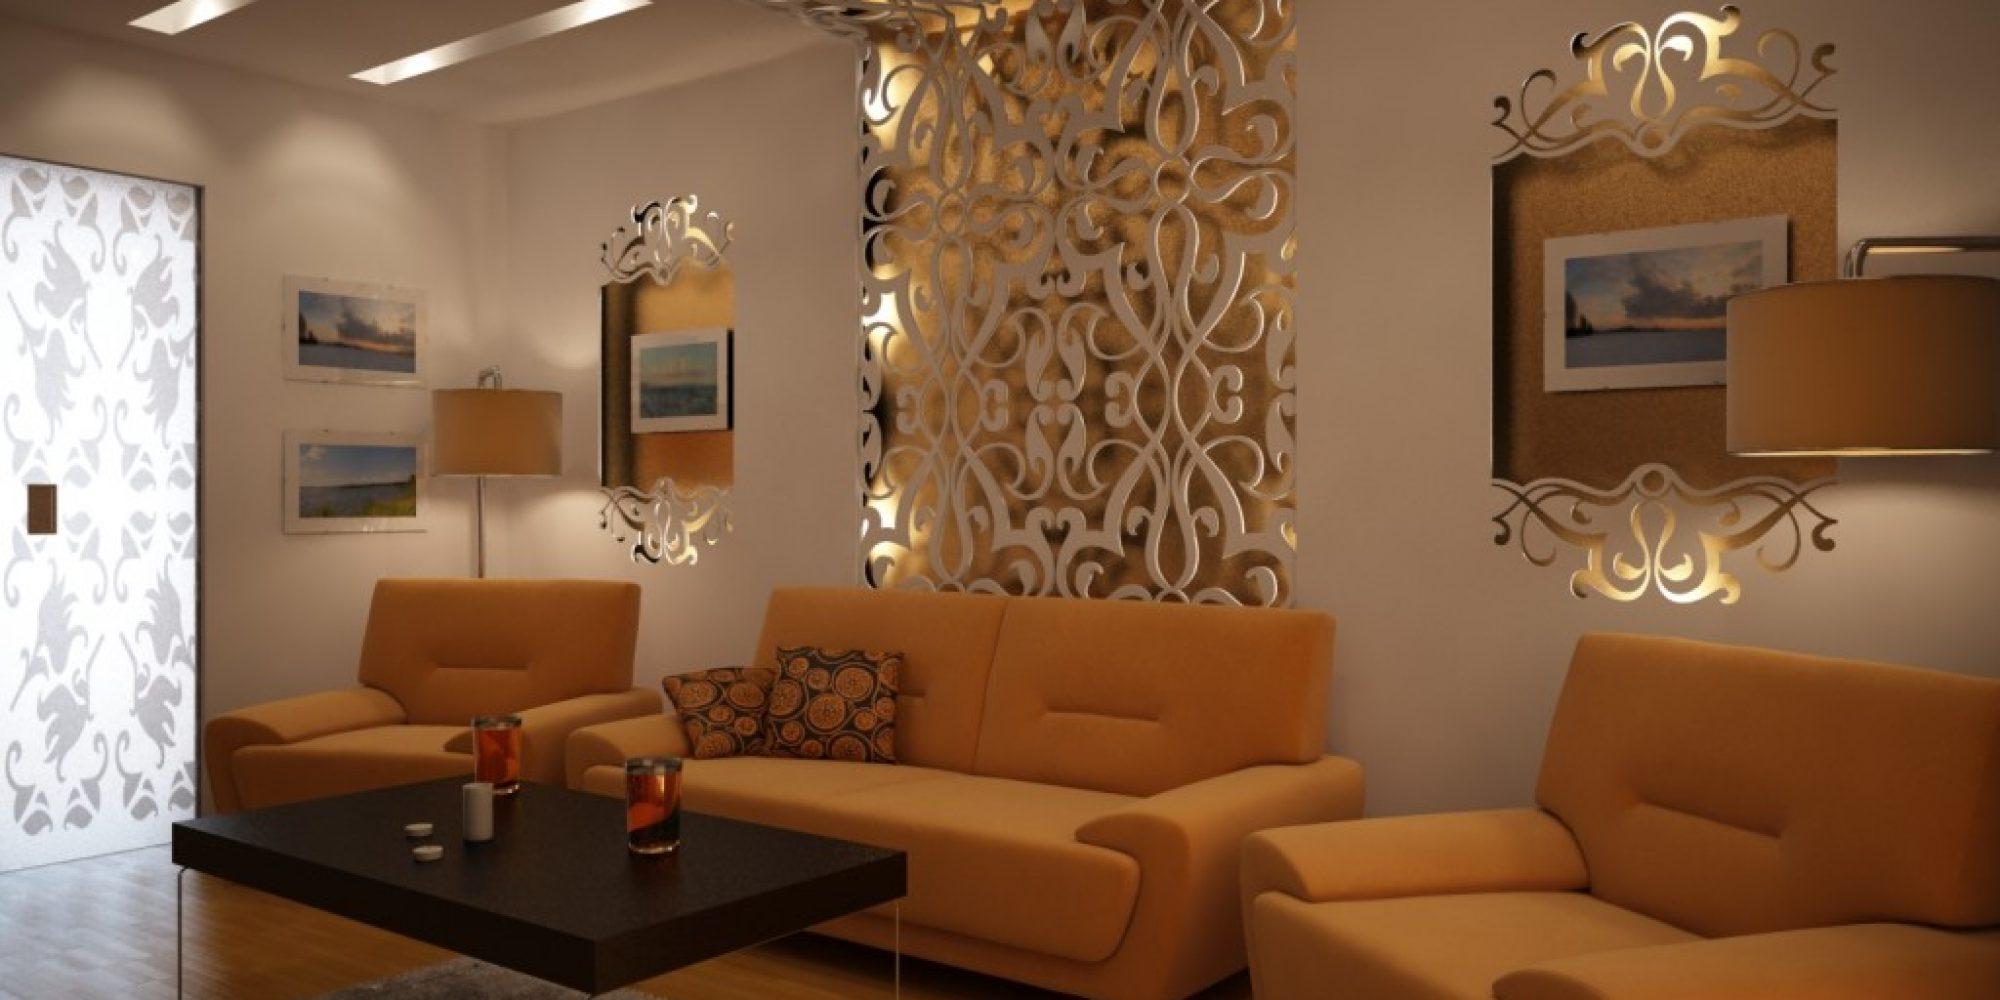 Interior-decoration-1024x683